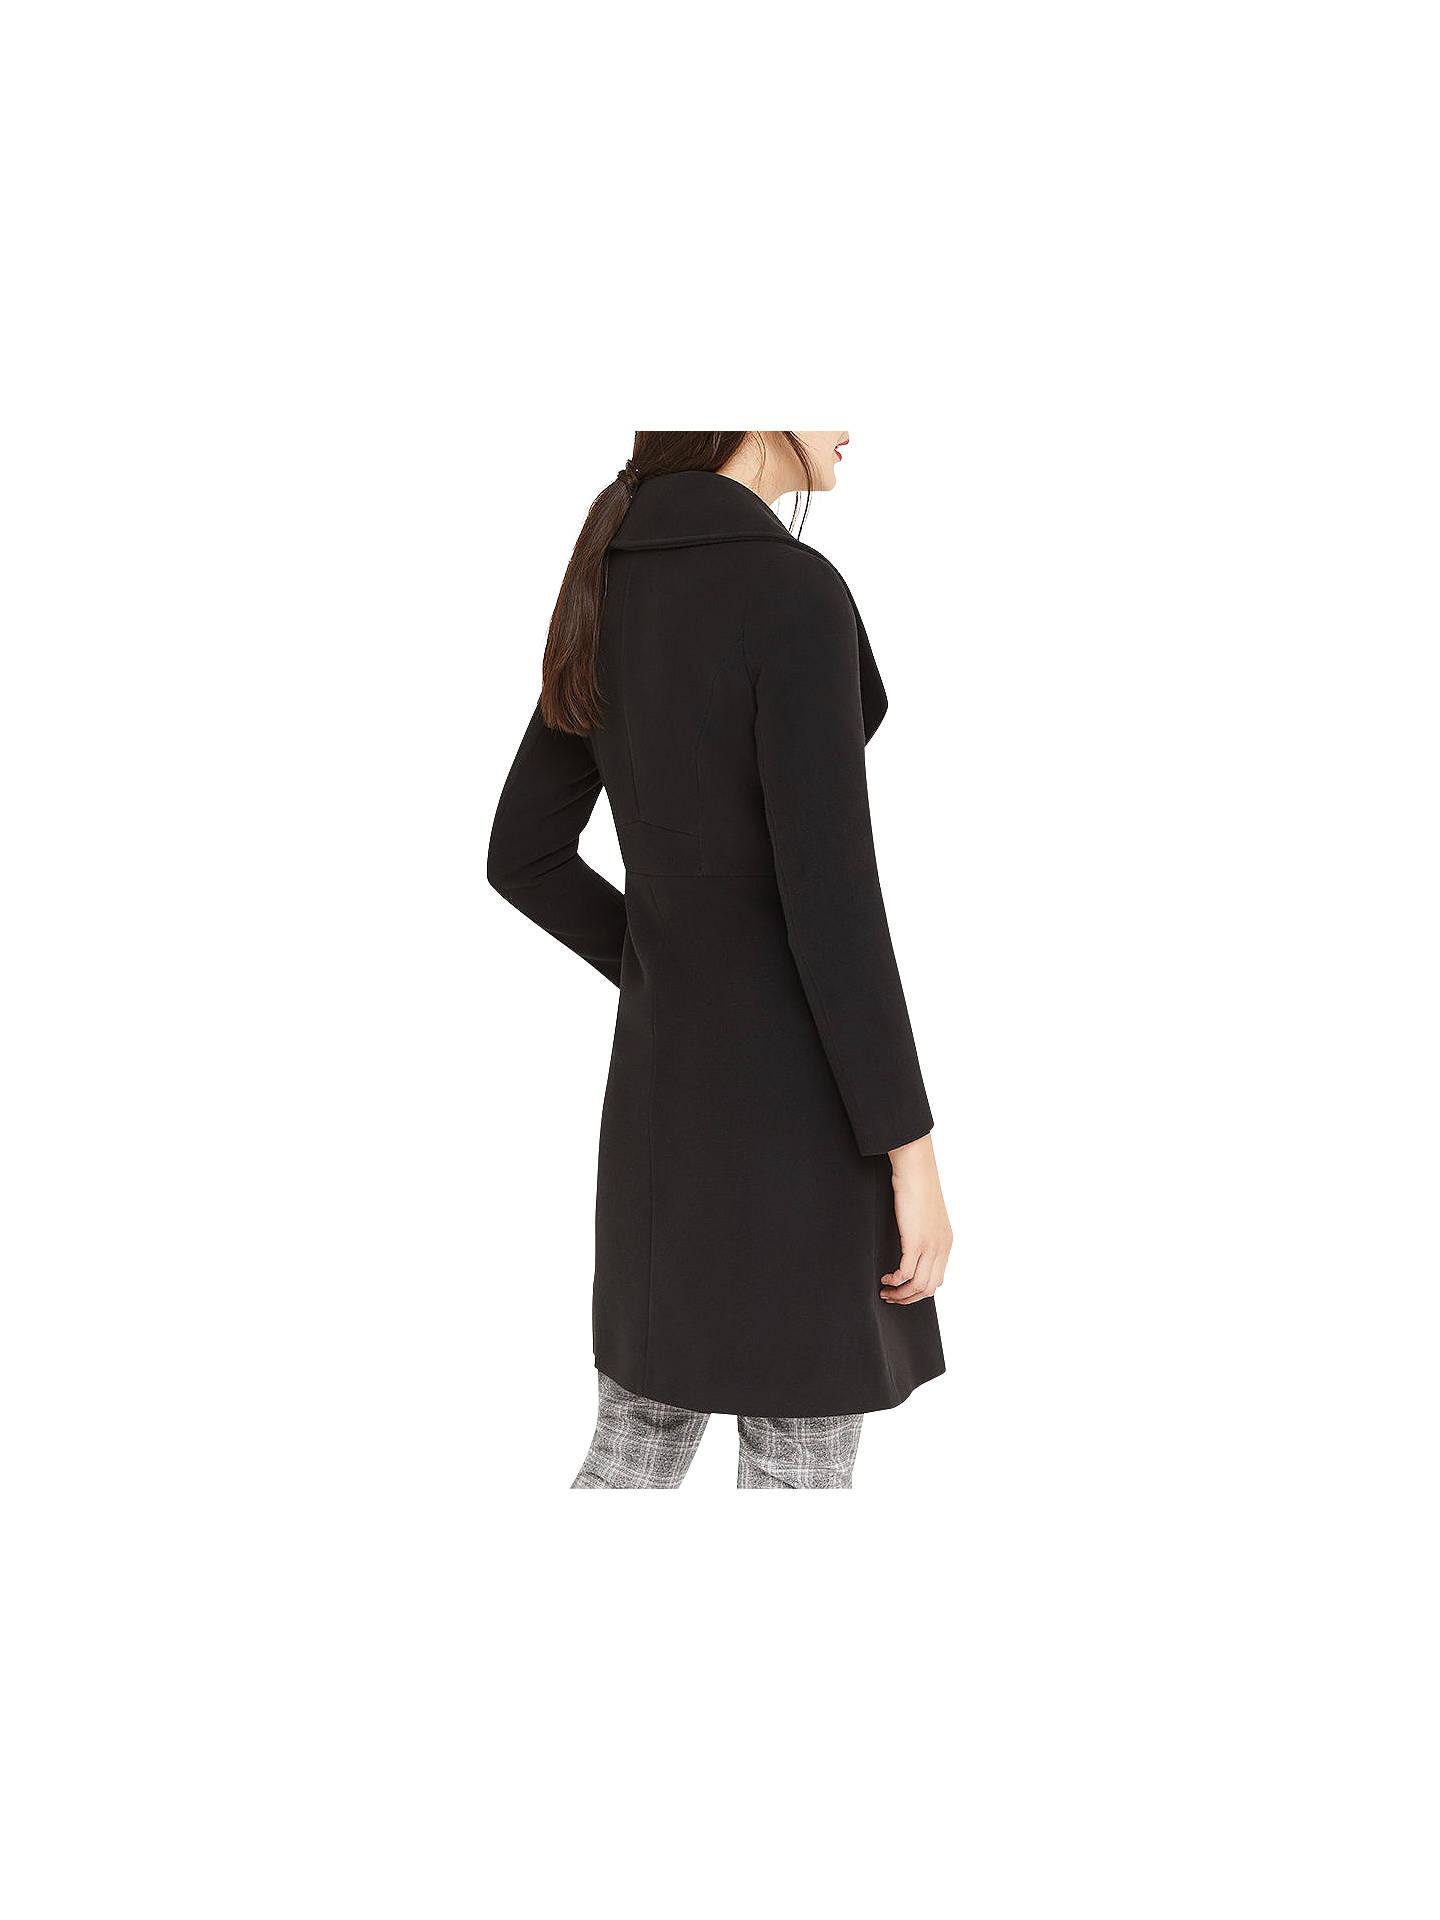 631c45183824 ... Buy Oasis Lily Premium Skater Coat, Black, XS Online at johnlewis.com  ...